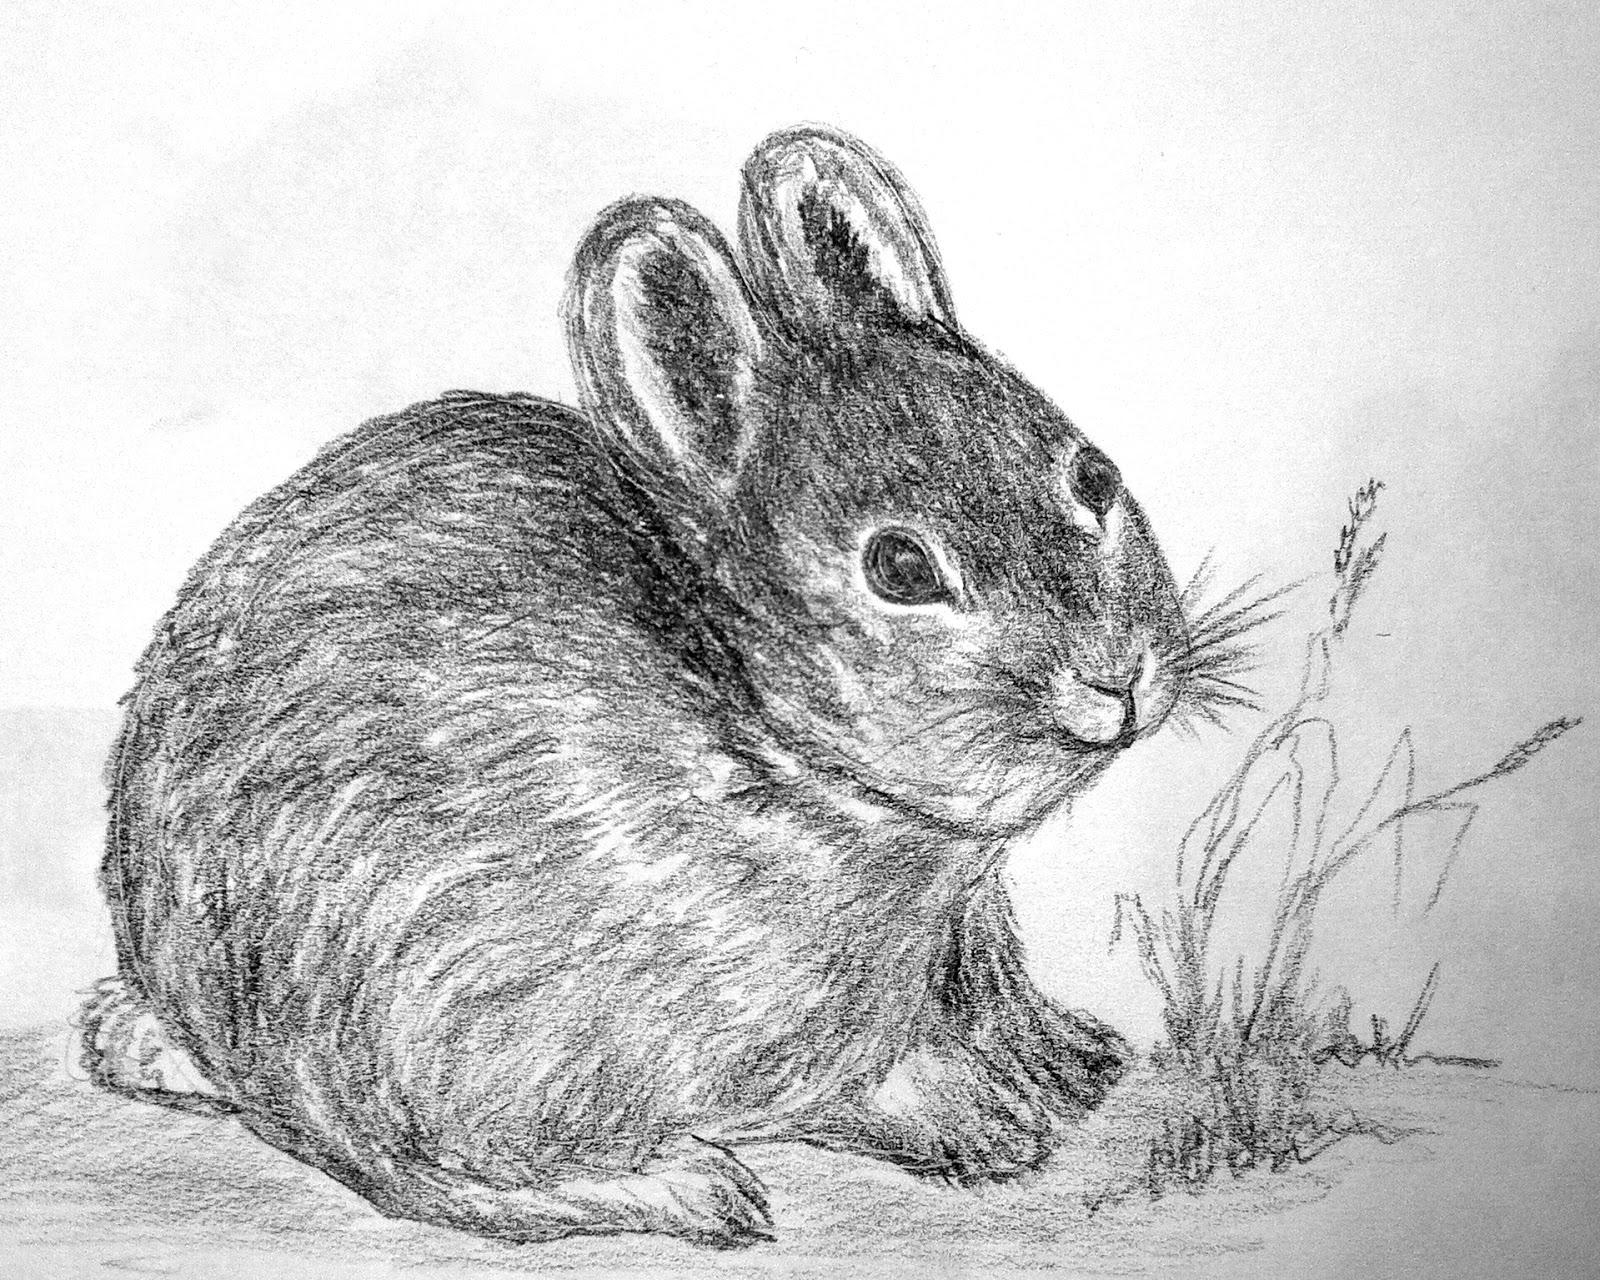 CMPimages: Pygmy Rabbit sketch